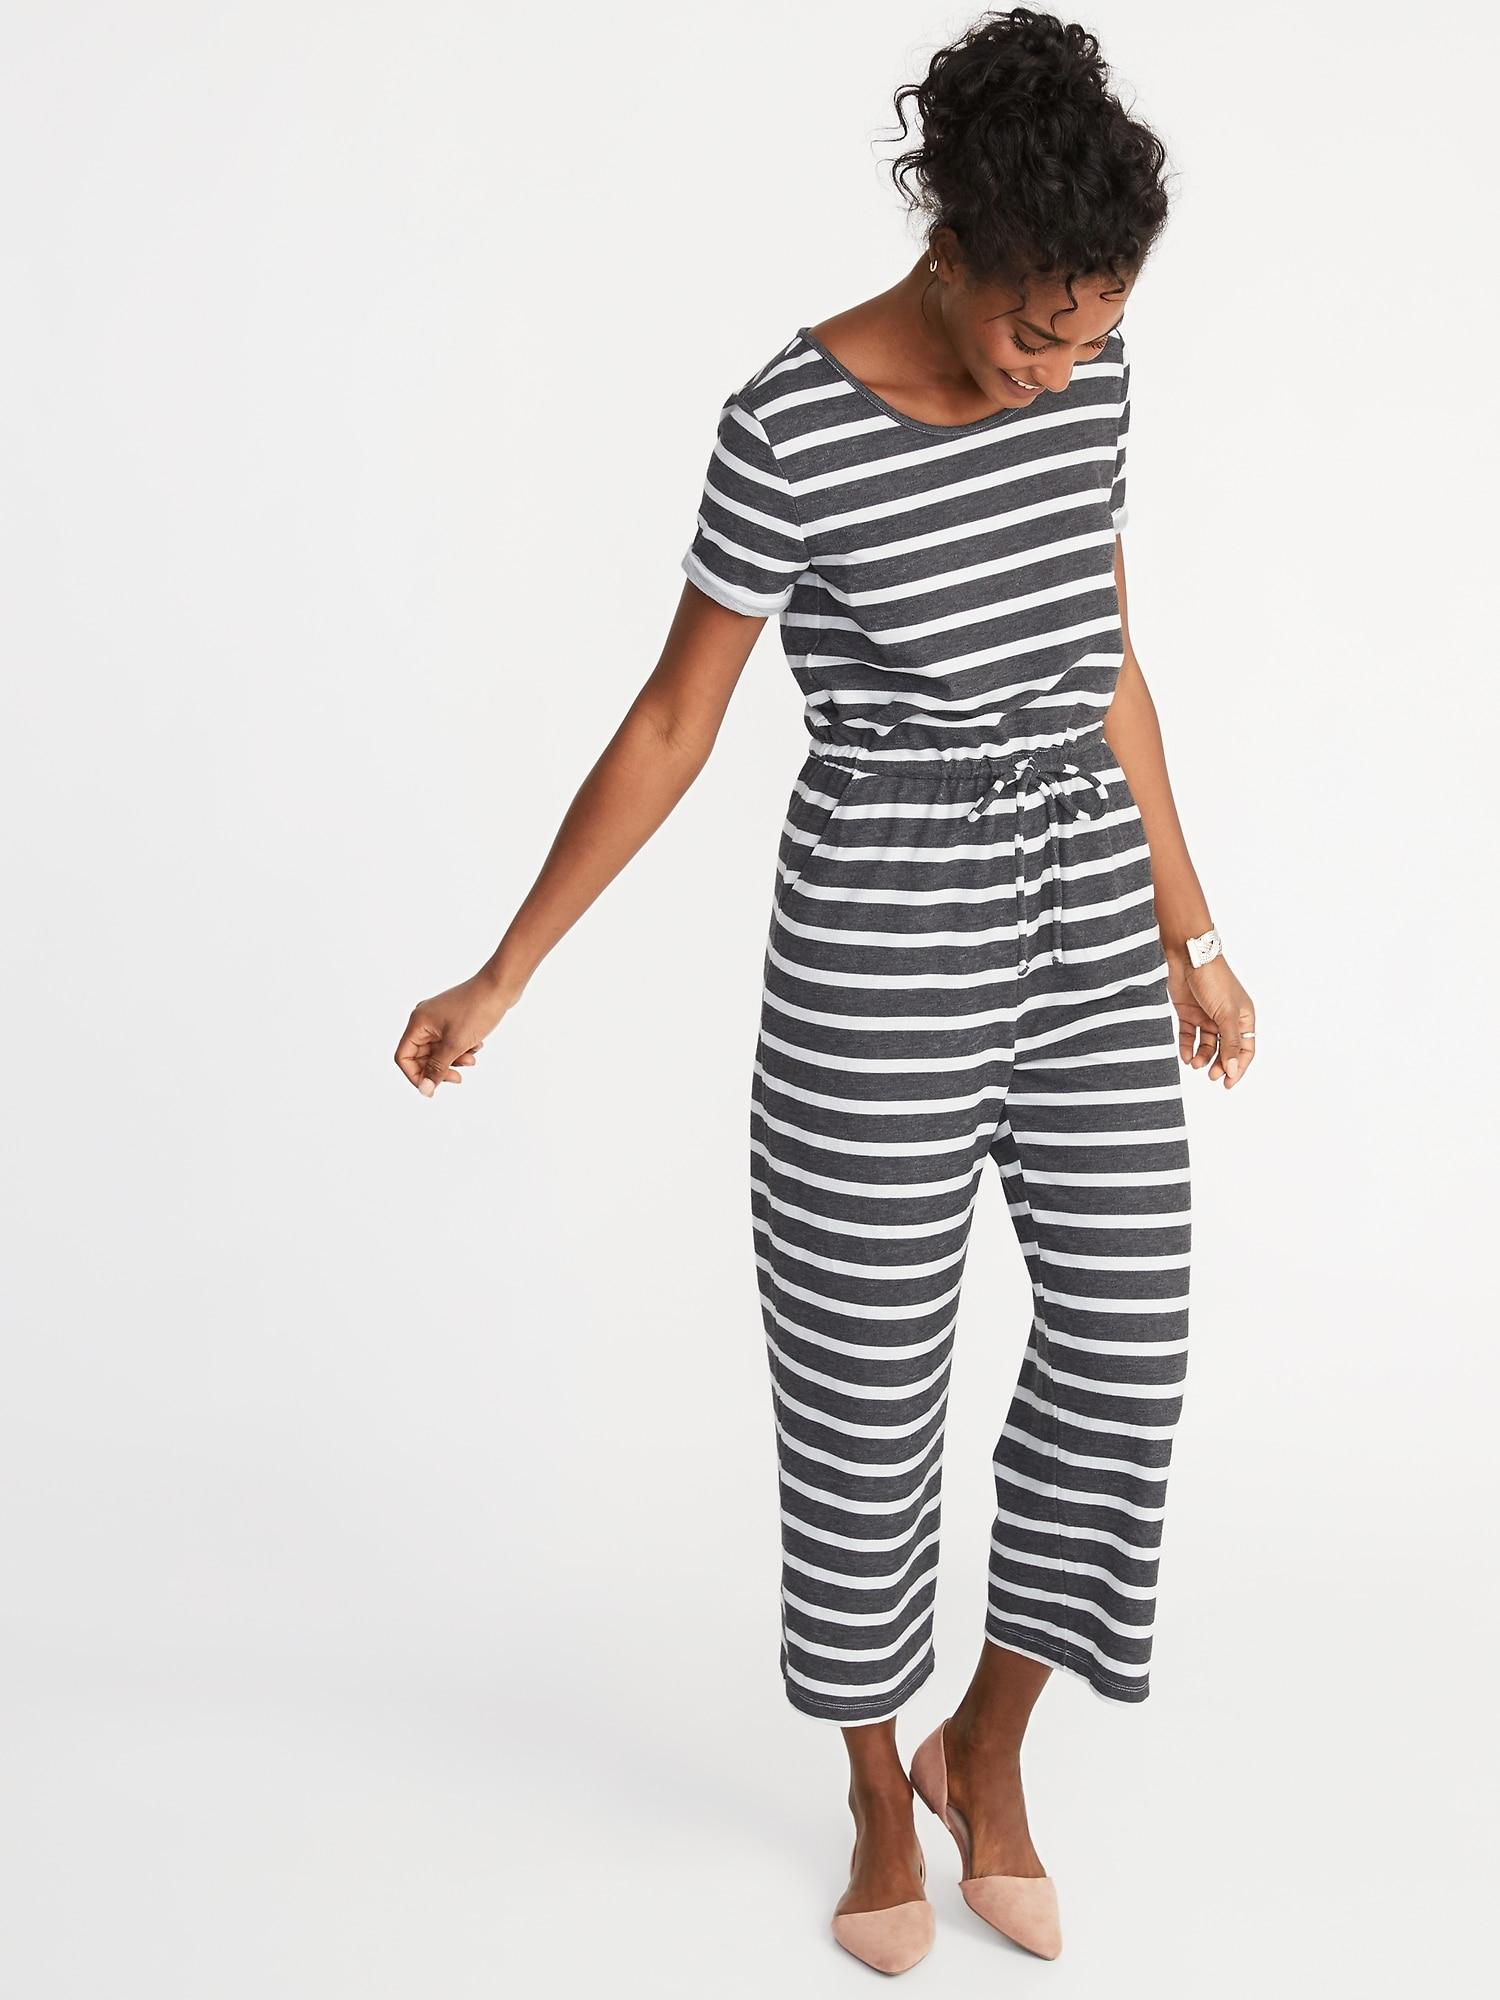 5c2aa75ed713 Waist-Defined Wide-Leg Bouclé-Jersey Jumpsuit for Women